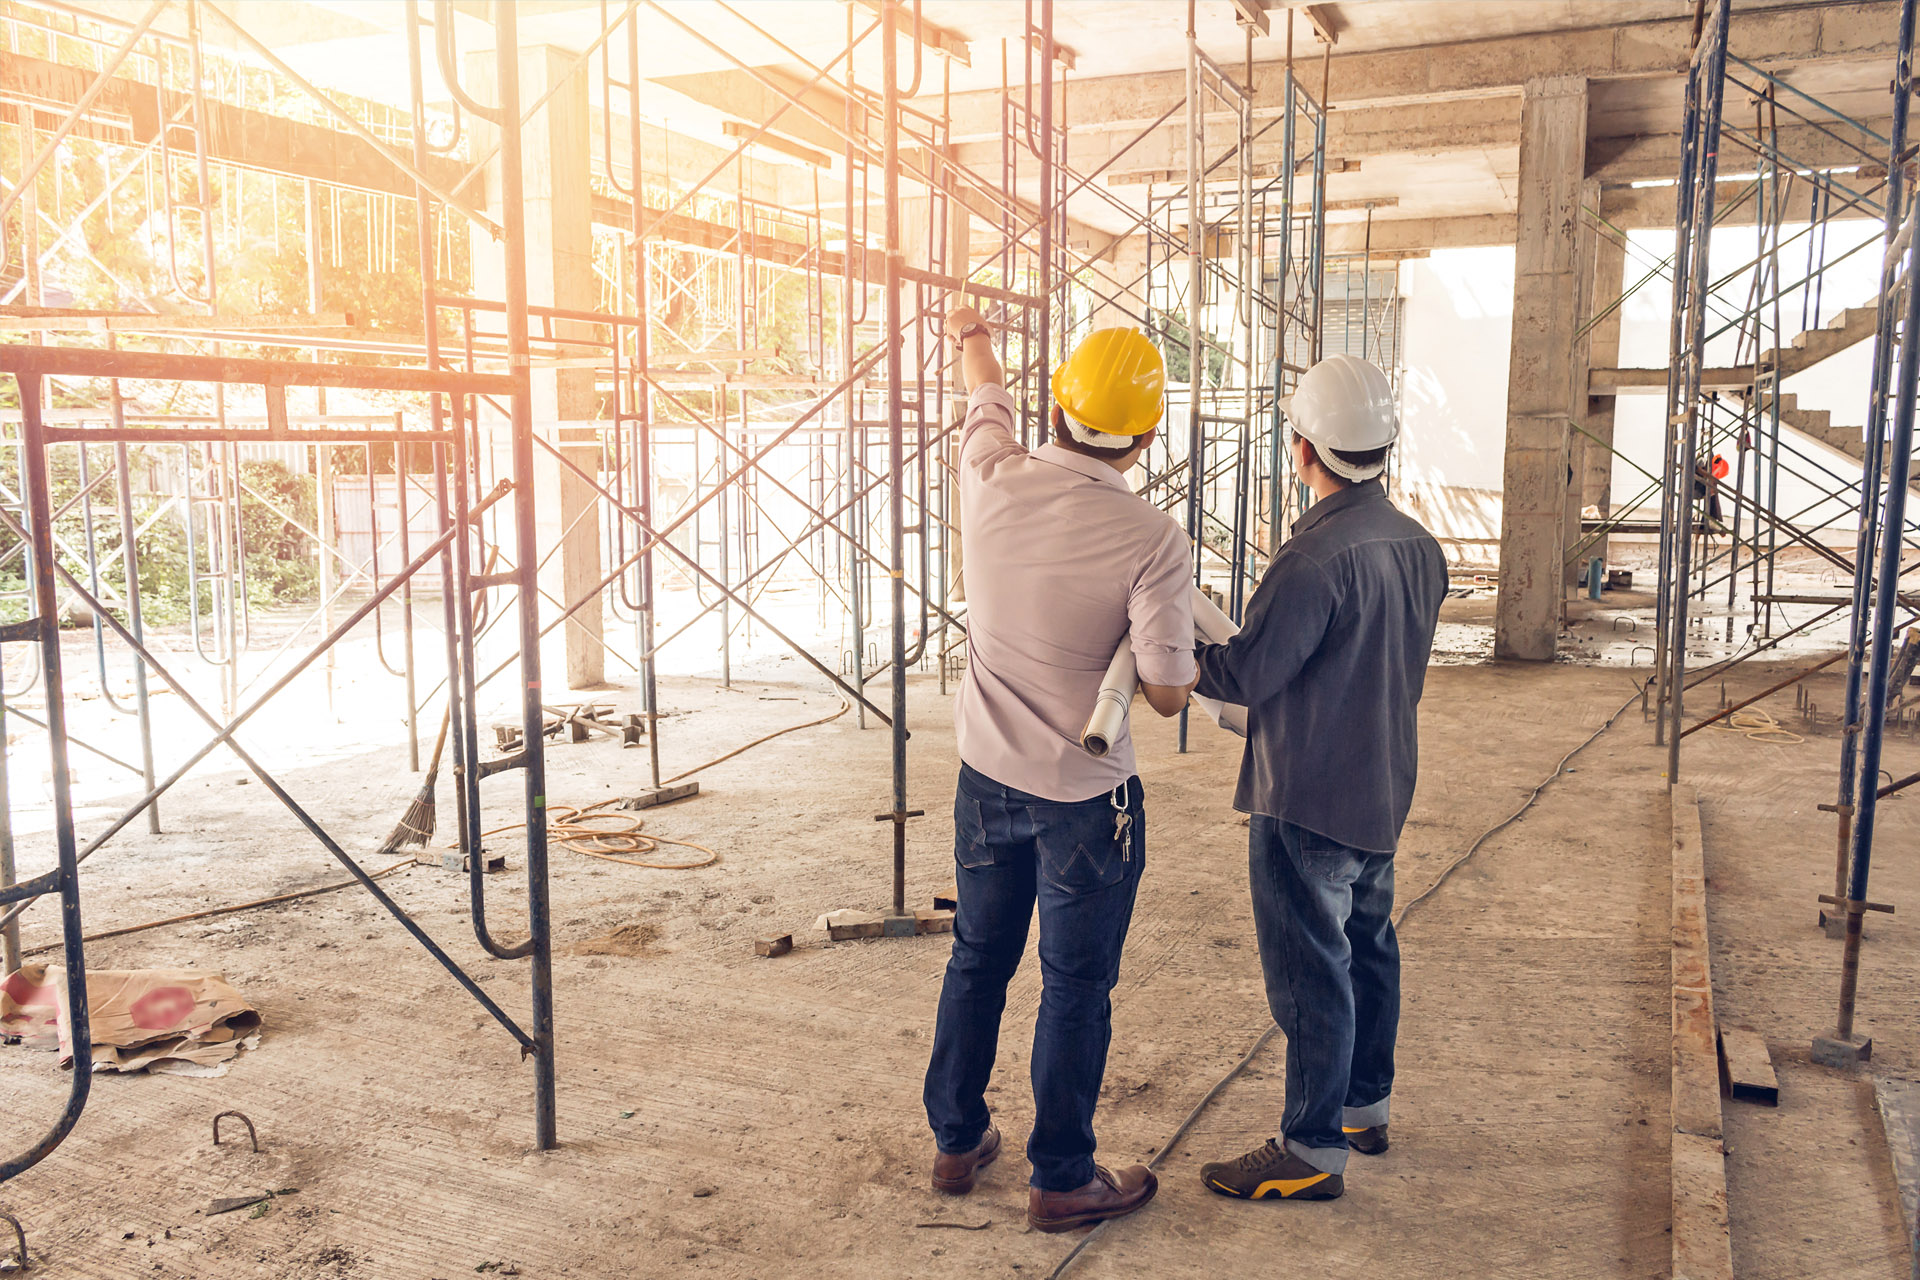 Planungsbesprechung auf Baustelle